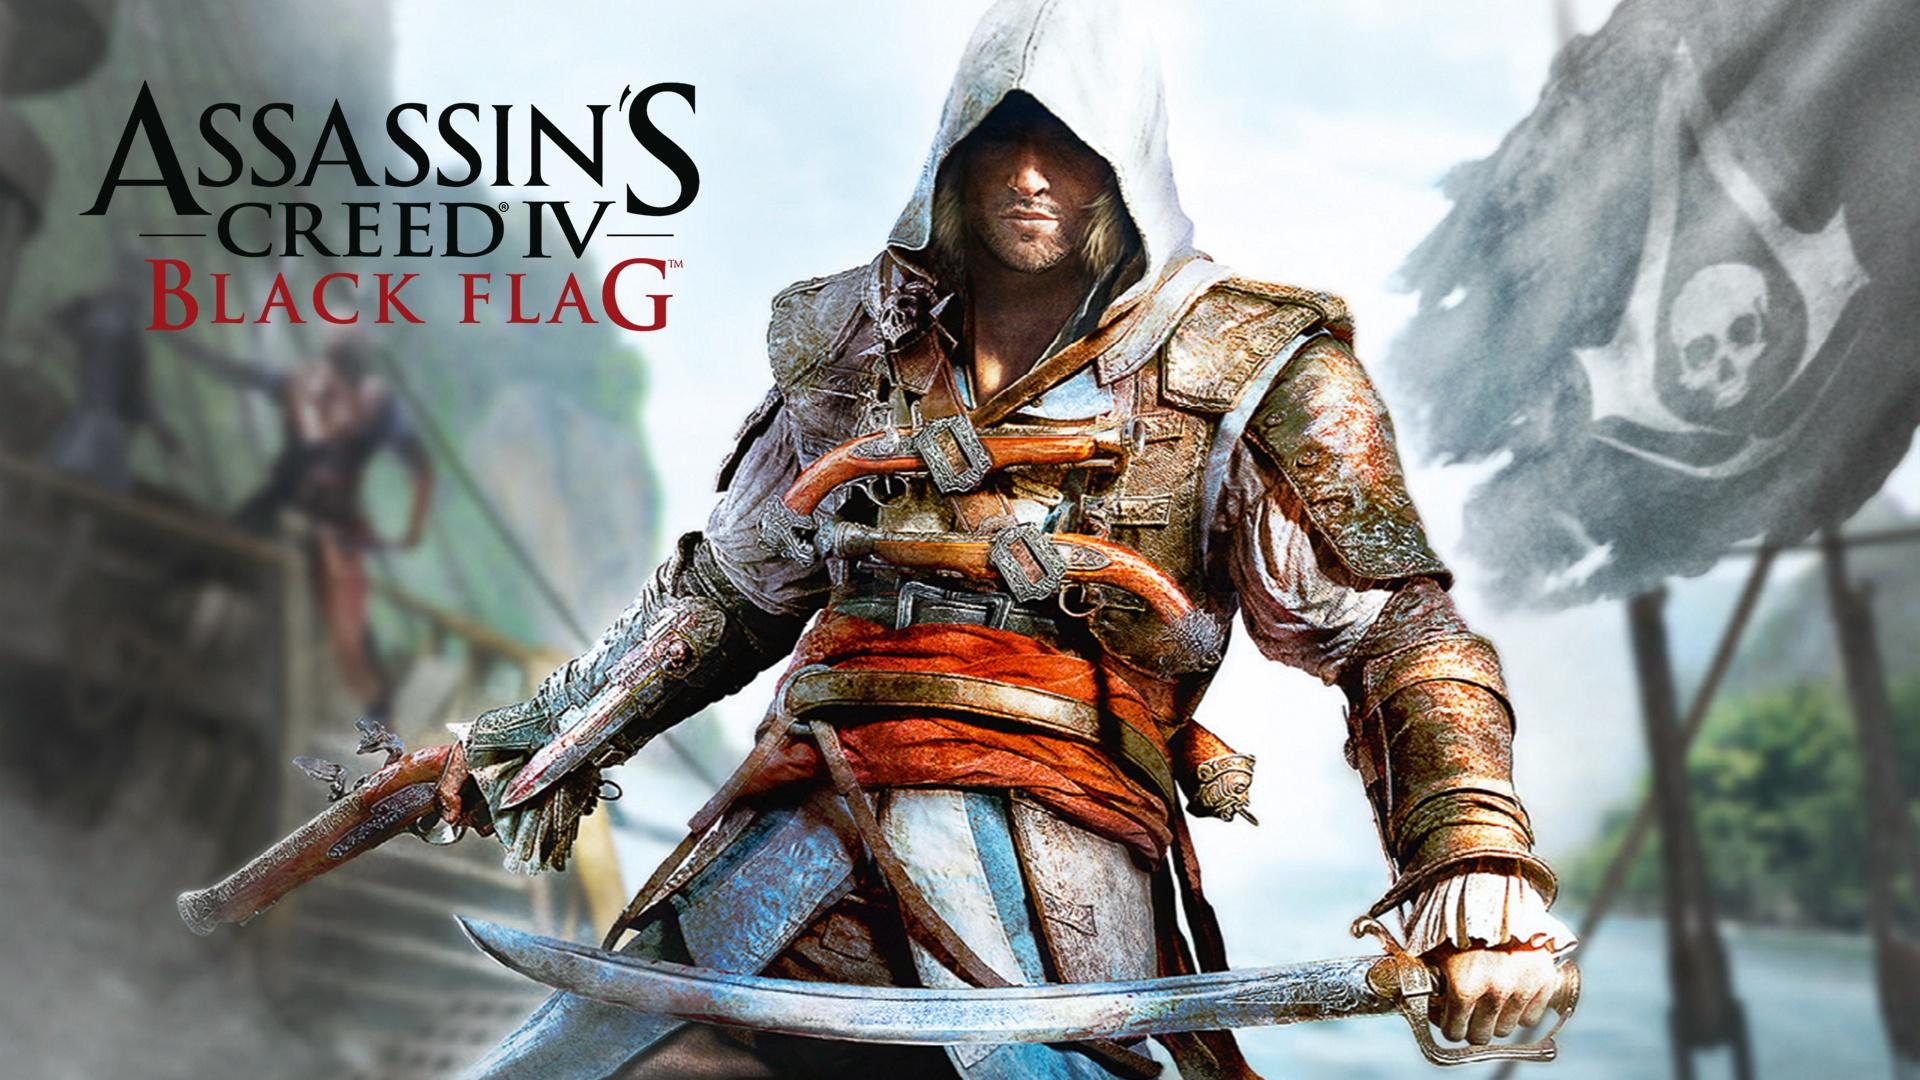 Assassins Creed Black Flag Wallpaper HD 1080p ImageBankbiz 1920x1080